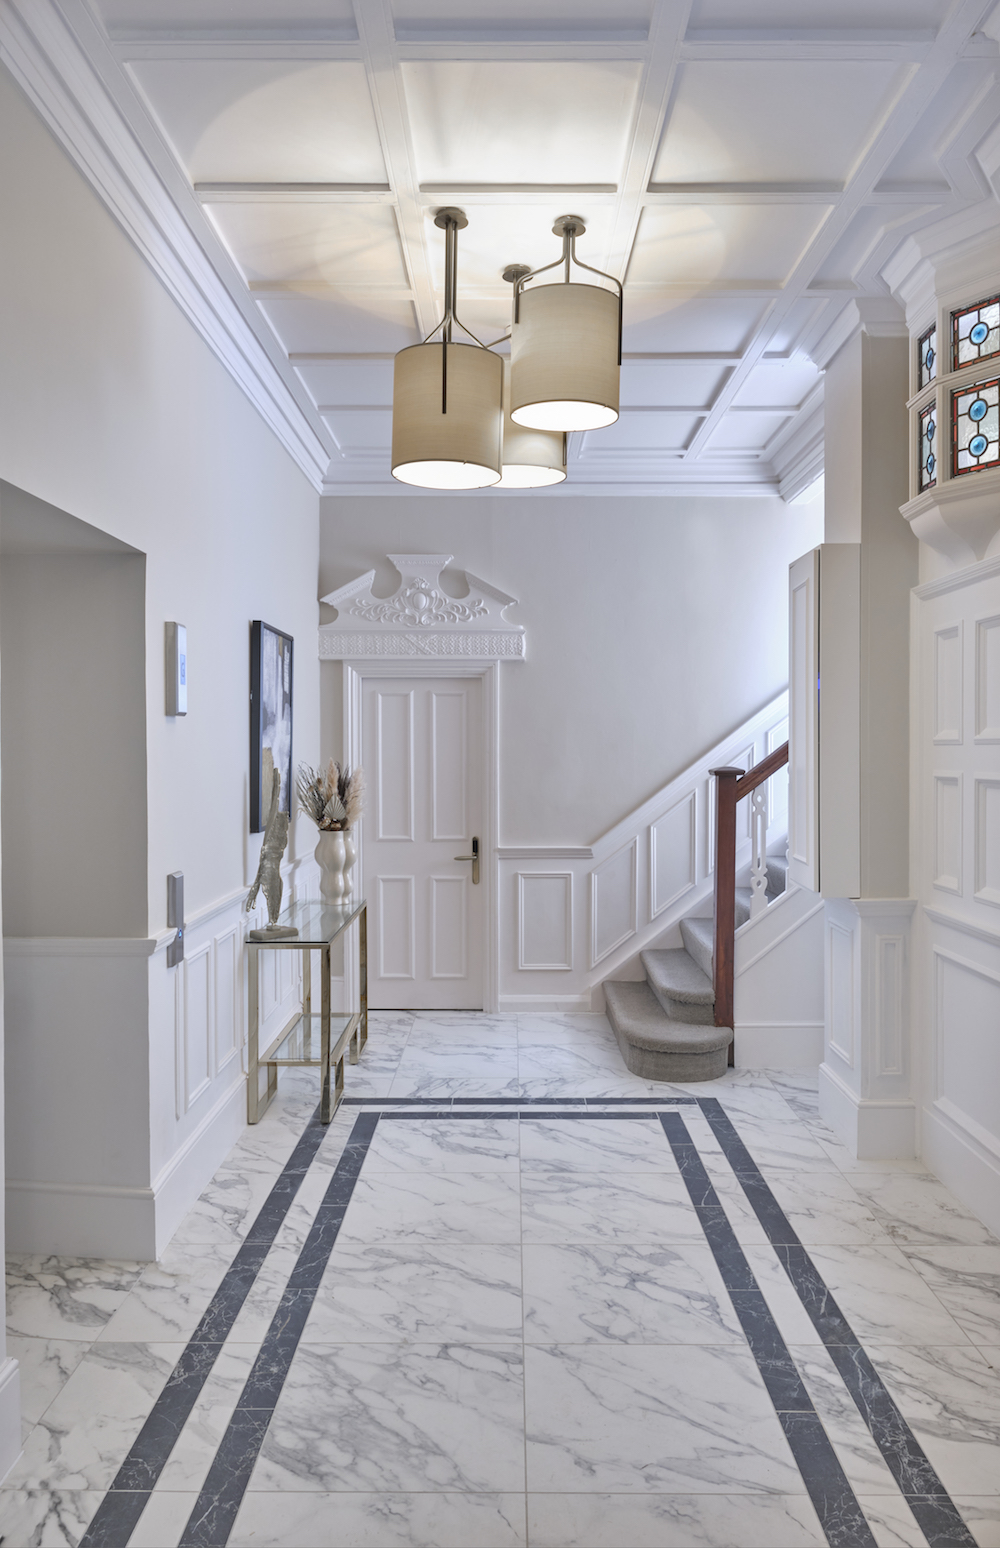 Image of marble corridor at 11 Cadogan Gardens appartment